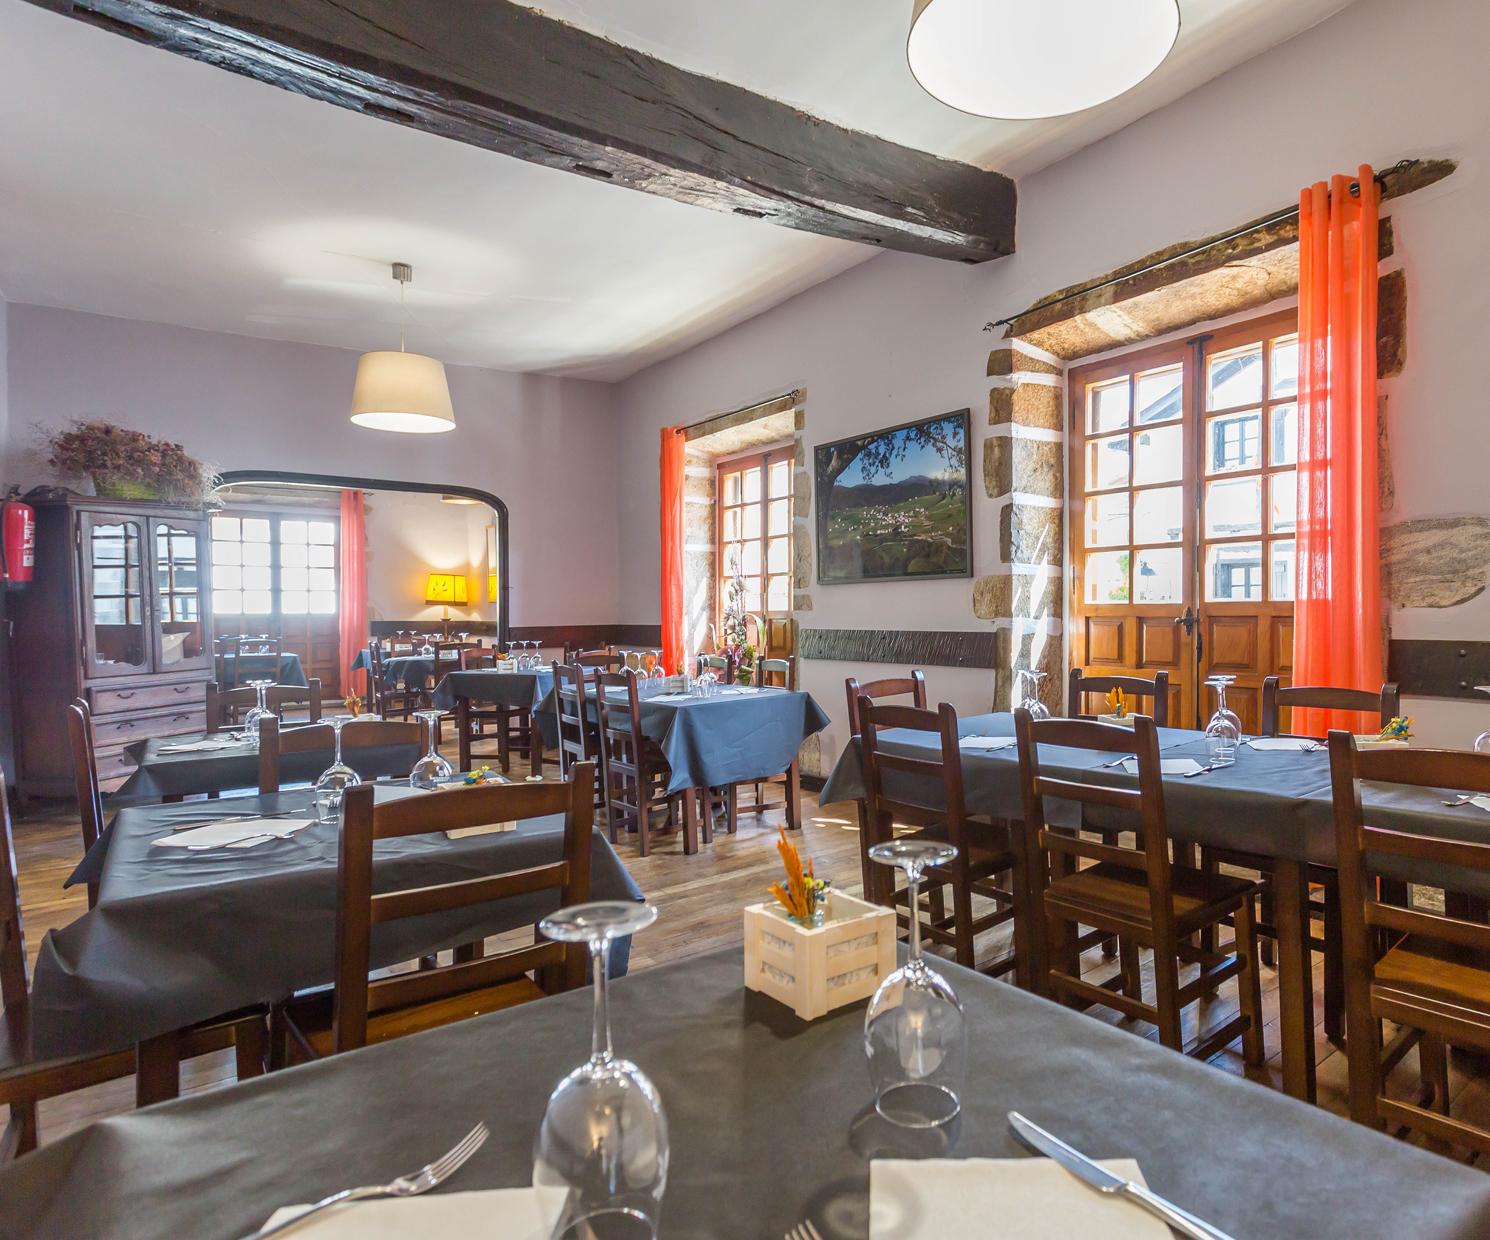 Restaurante para eventos en Navarra